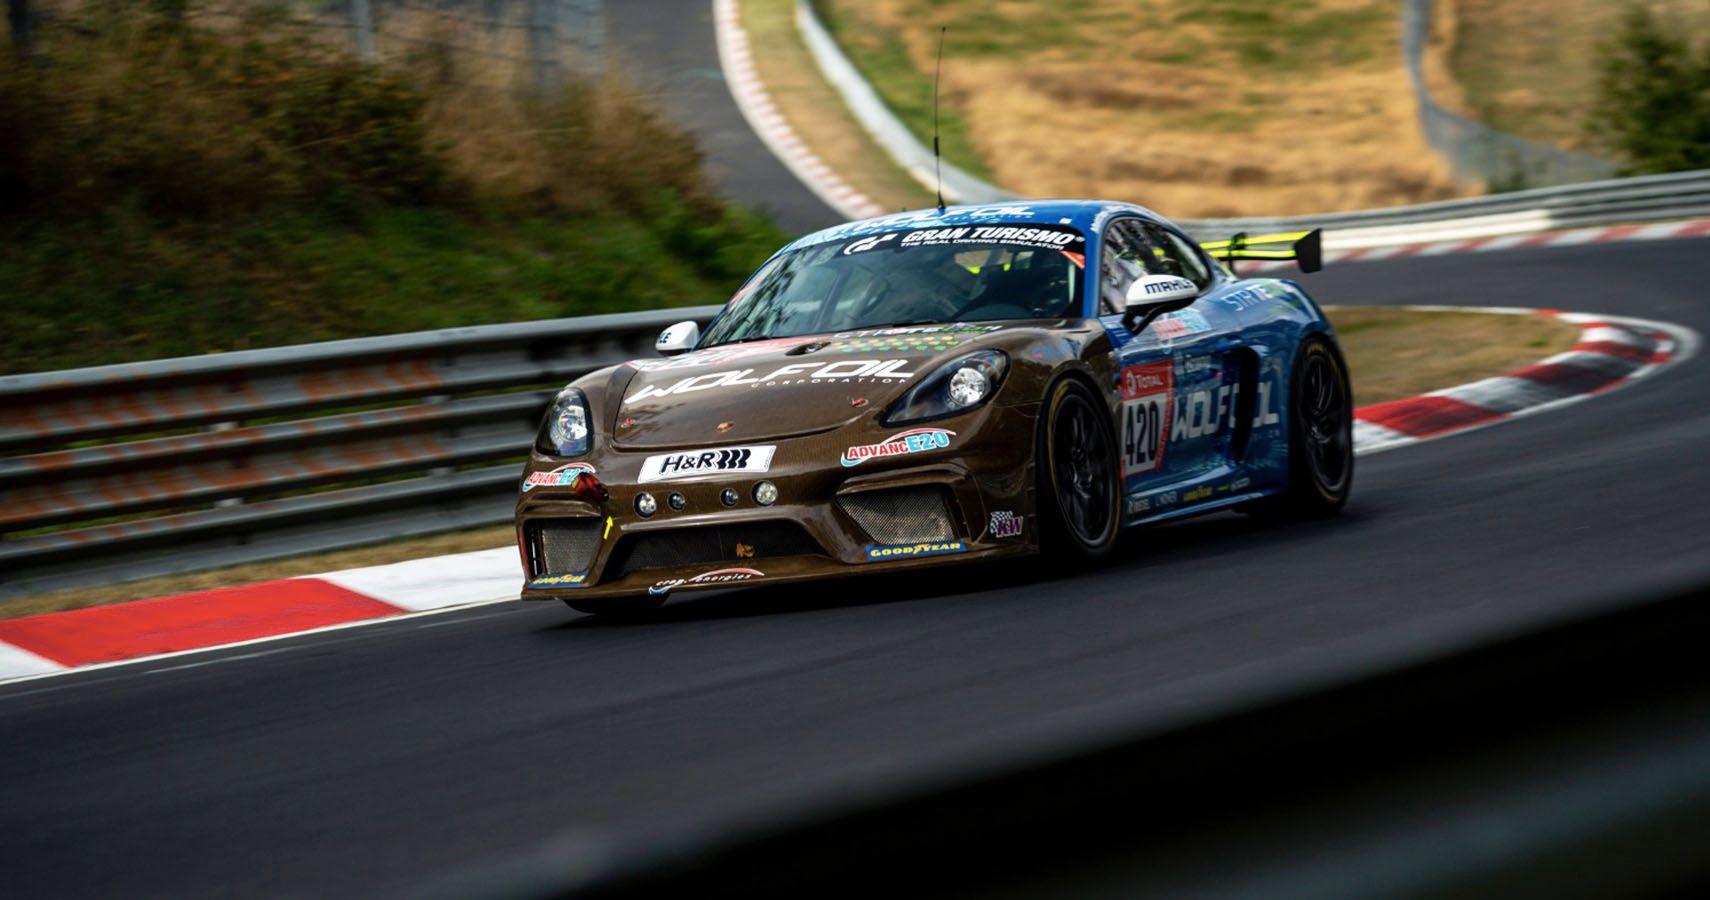 Porsche Unveils Natural, Renewable Race Car Bodies For 24 Hours Of Nurburgring